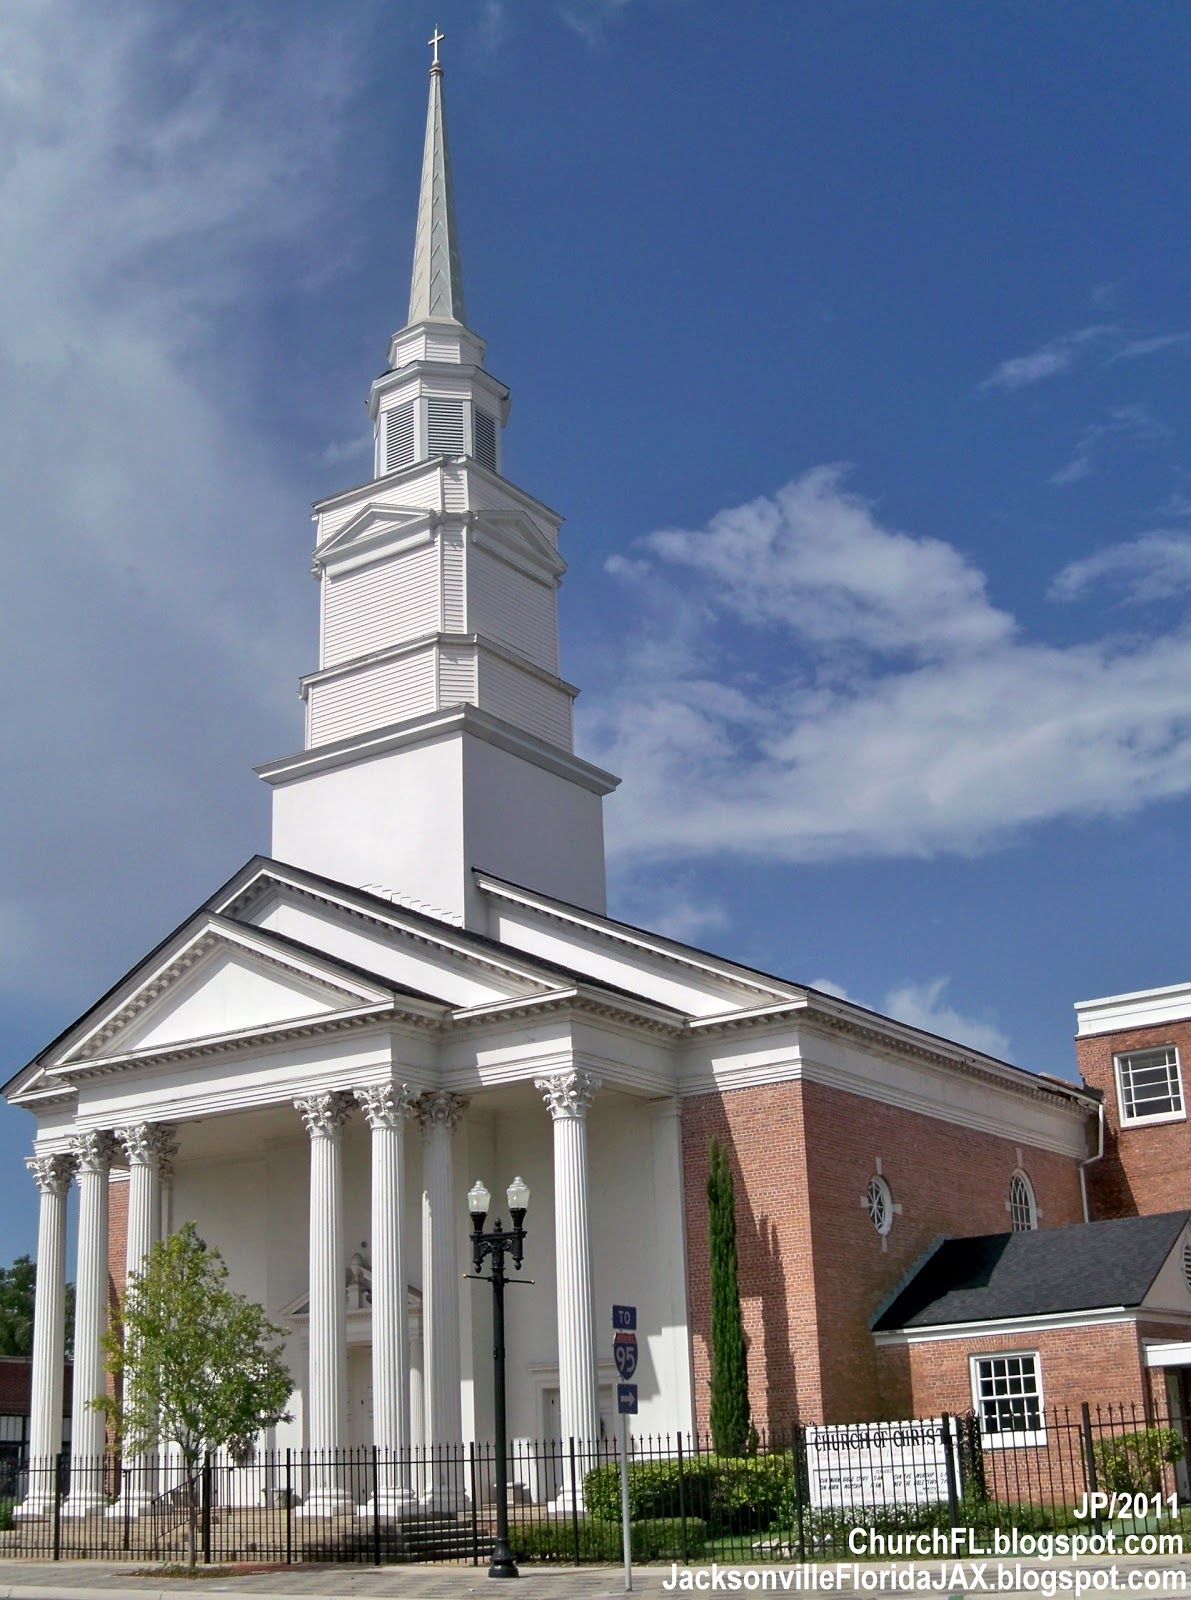 http://2.bp.blogspot.com/-ZwSeGAydH9w/TmO7o7Cy5lI/AAAAAAAEbgM/ugcV6Fbg2ew/s1600/CHURCH+OF+CHRIST+JACKSONVILLE+FLORIDA+8th+St.%252CWestside+Church+of+Christ+Jacksonville+Duval+County+FL.+JAX.JPG